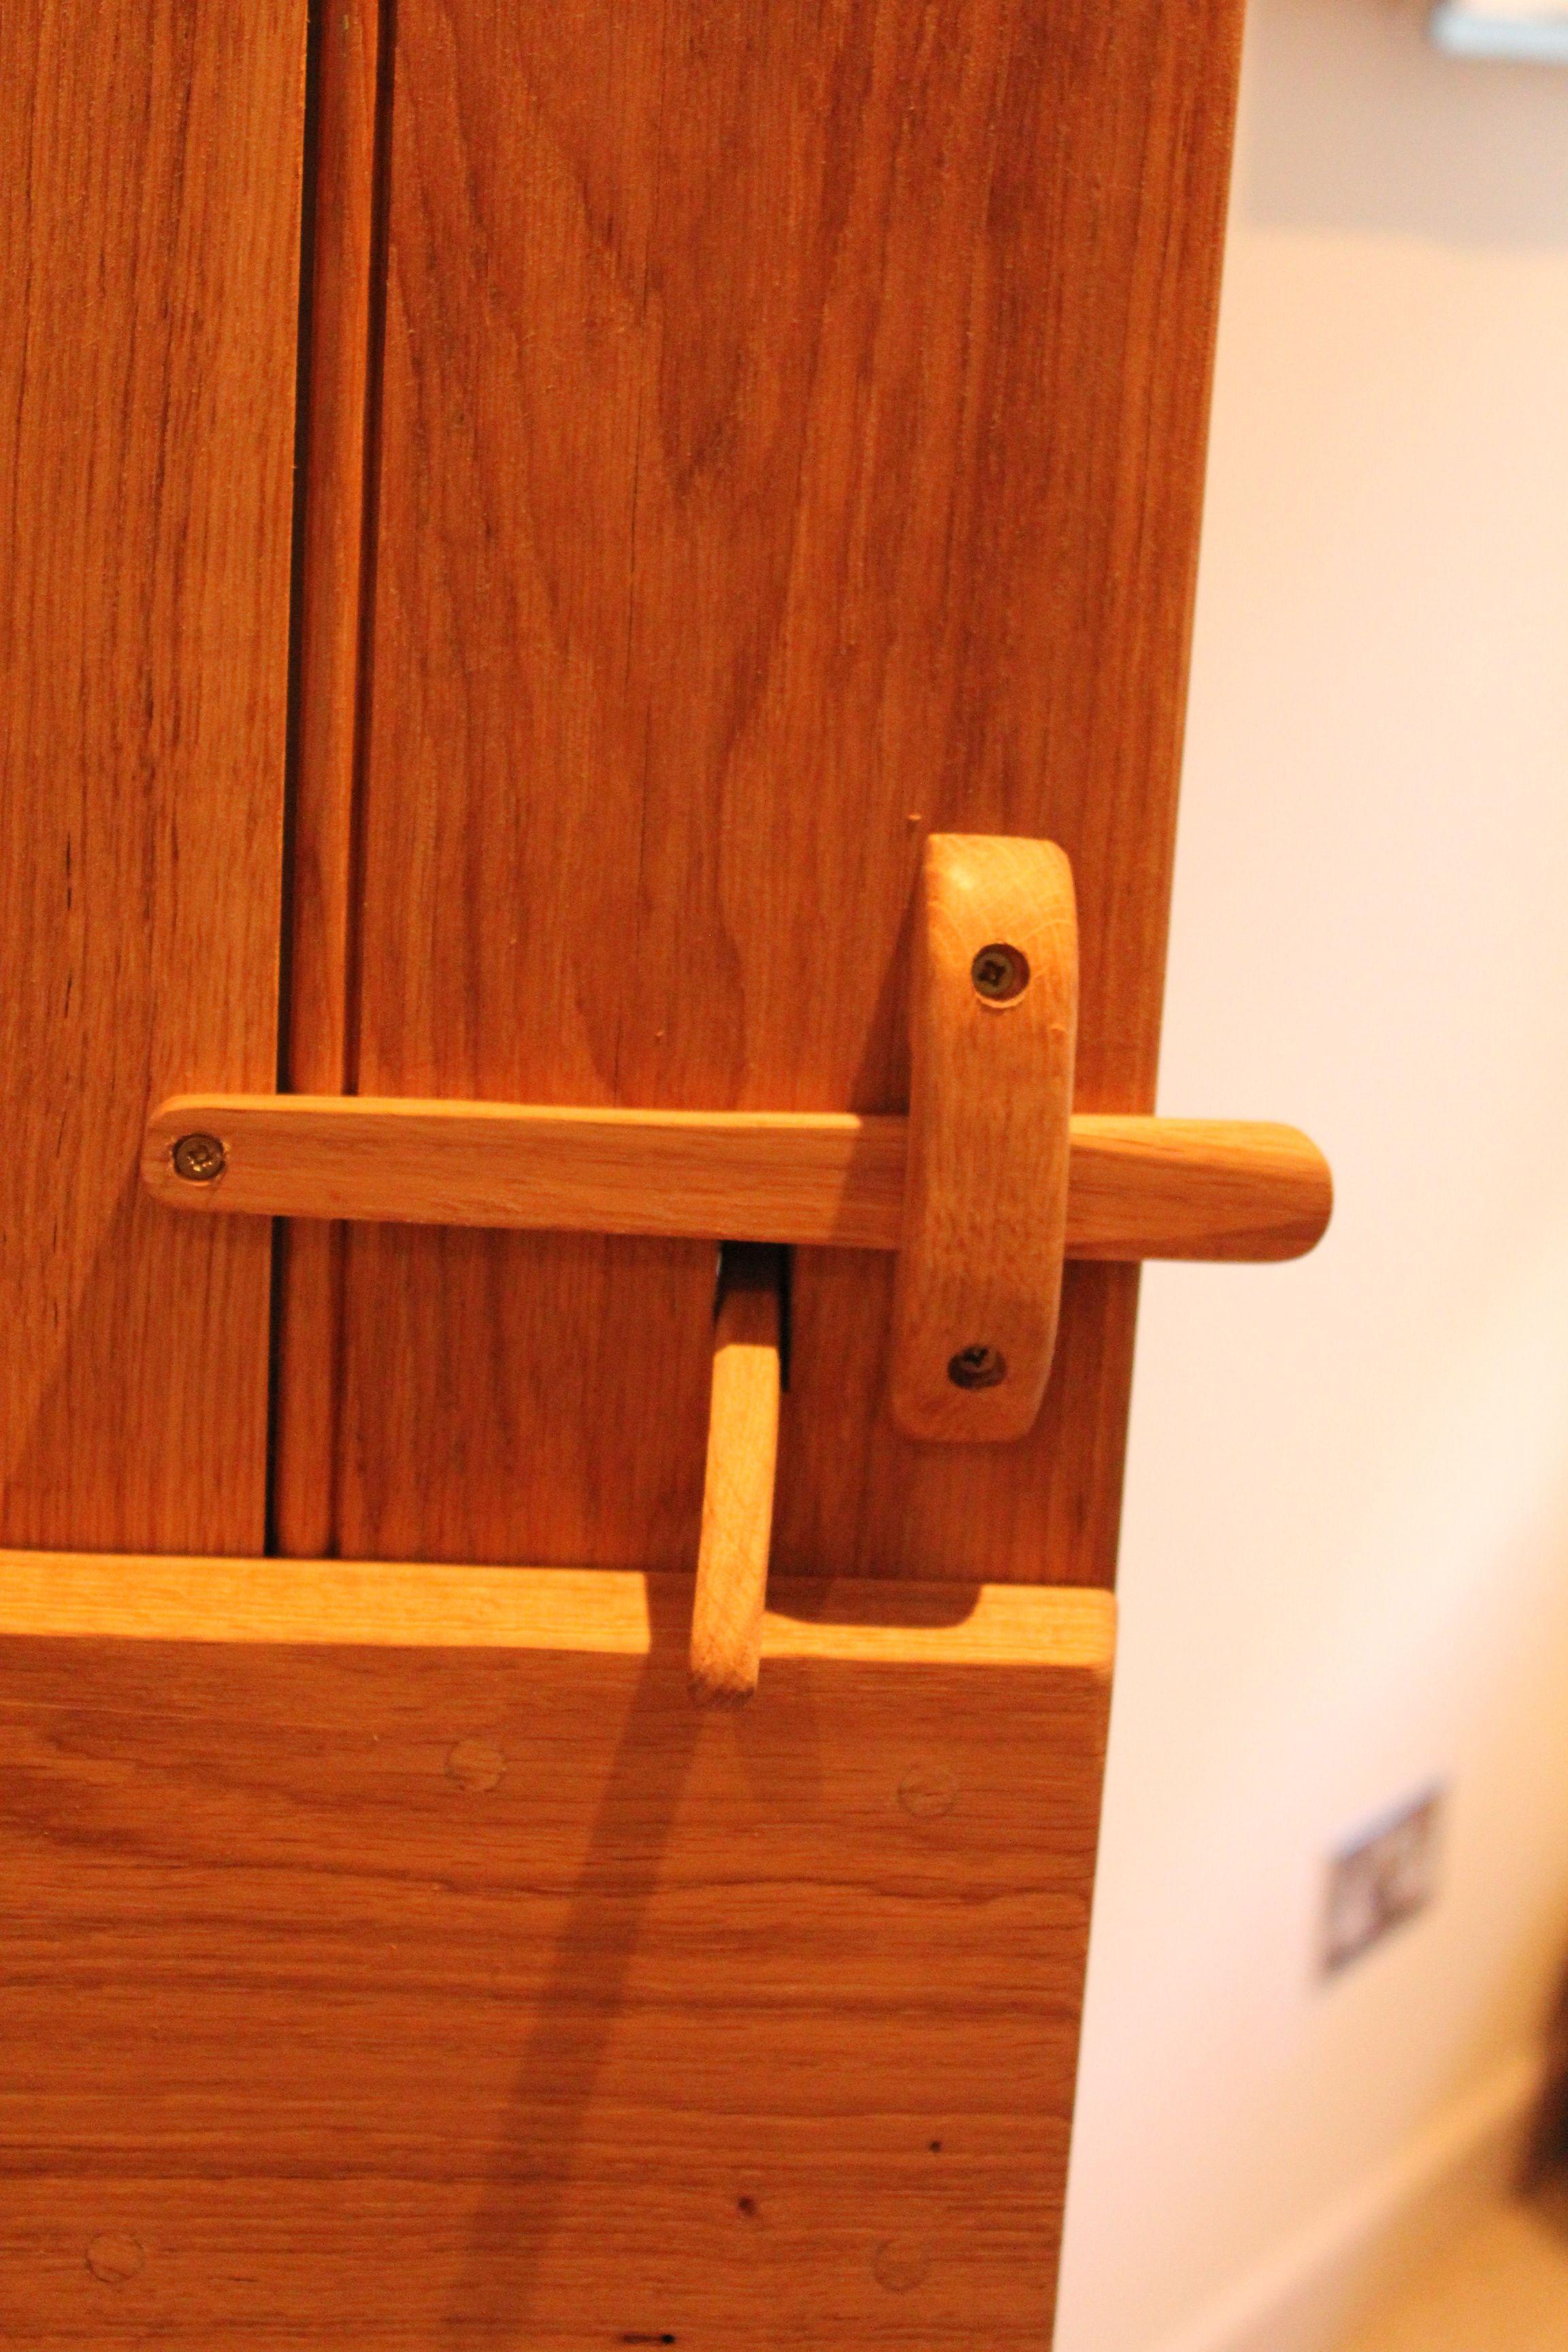 handmade door handles | Scott Le Breton Limited | Pinterest | Door handles Doors and Woods & handmade door handles | Scott Le Breton Limited | Pinterest | Door ...